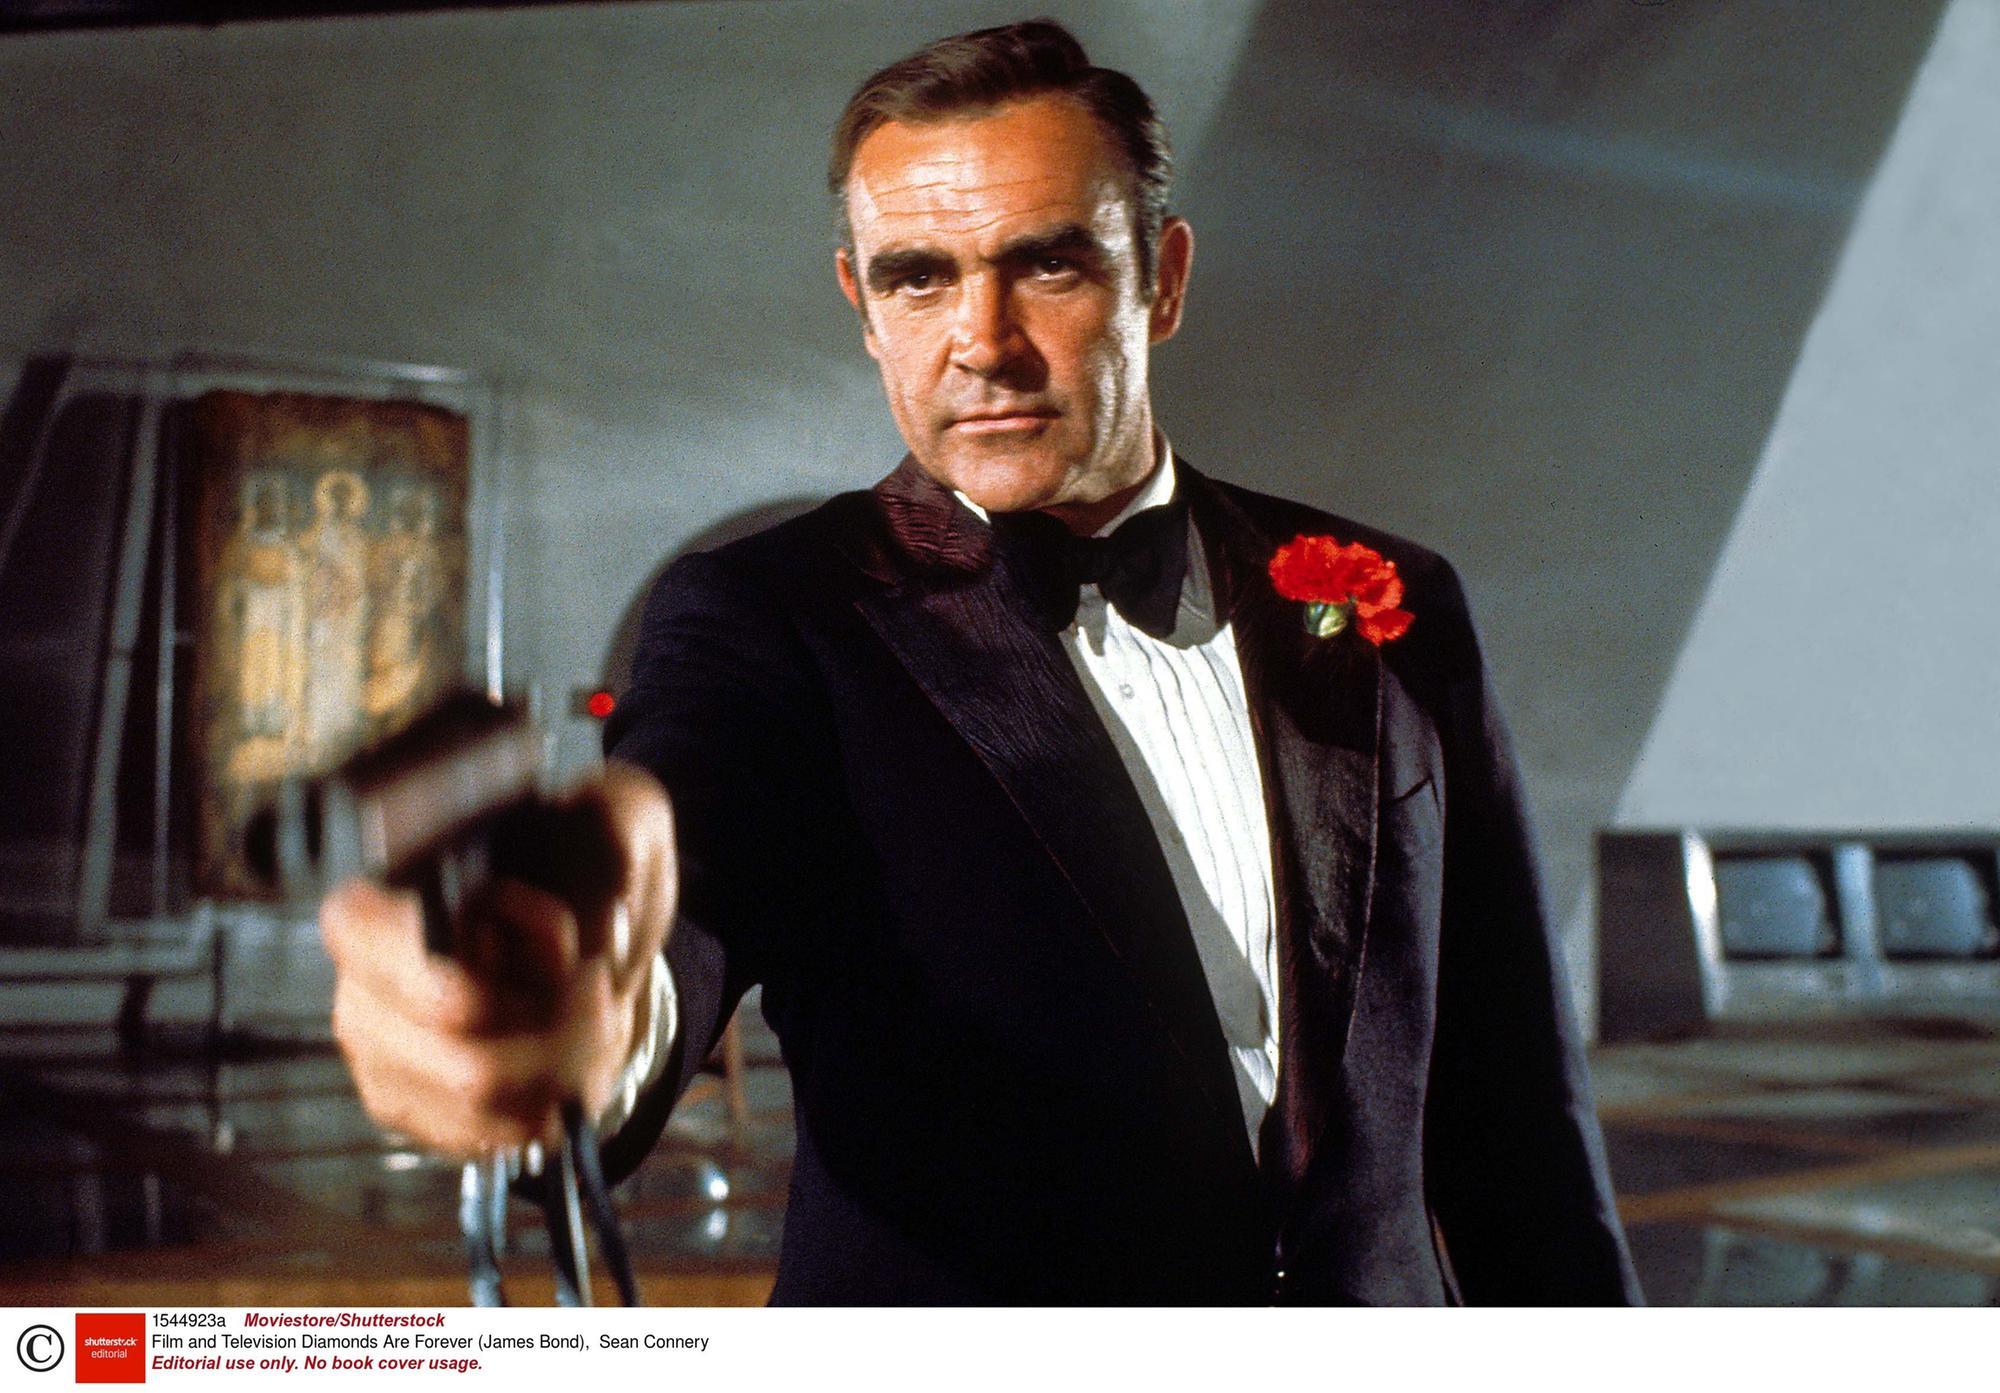 Sir Sean Connery Voted Best James Bond As Edinburgh Actor Nears 90 The Scotsman